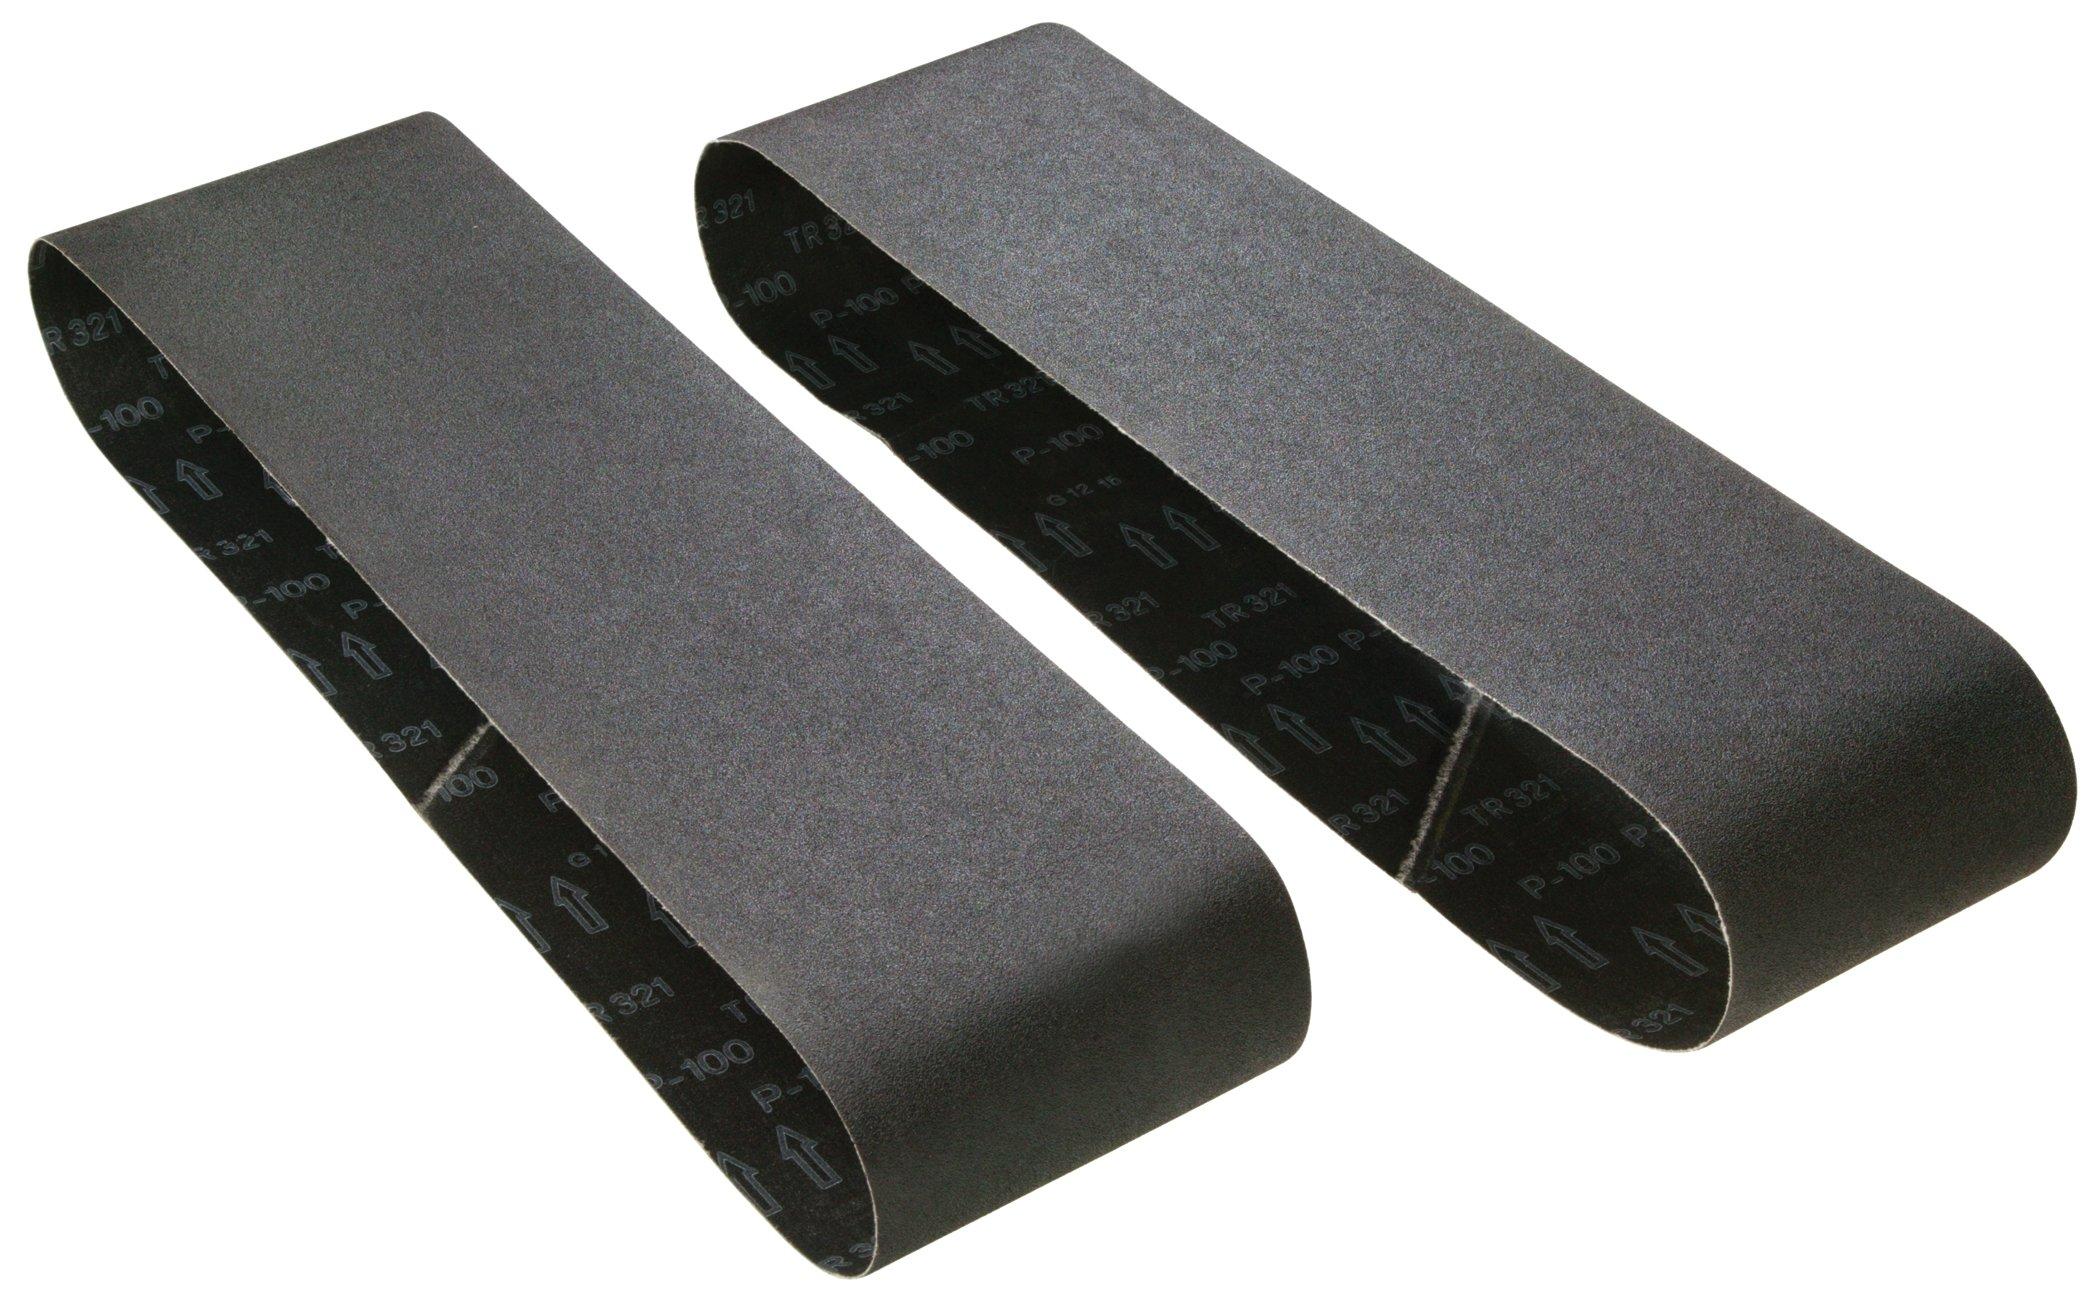 Woodstock D1262 6-Inch by 48-Inch 220 Grit Aluminum Oxide Sanding Belt, 2-Pack